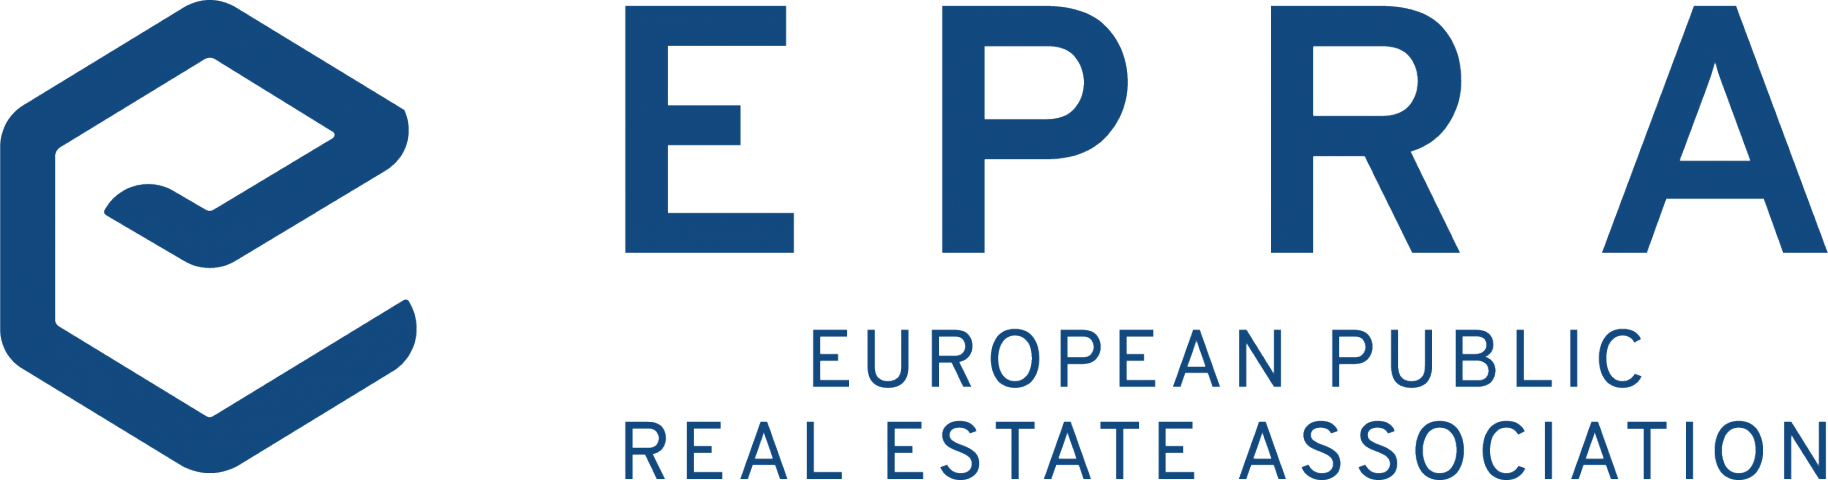 EPRA-logo-horizontal-lockup-blue